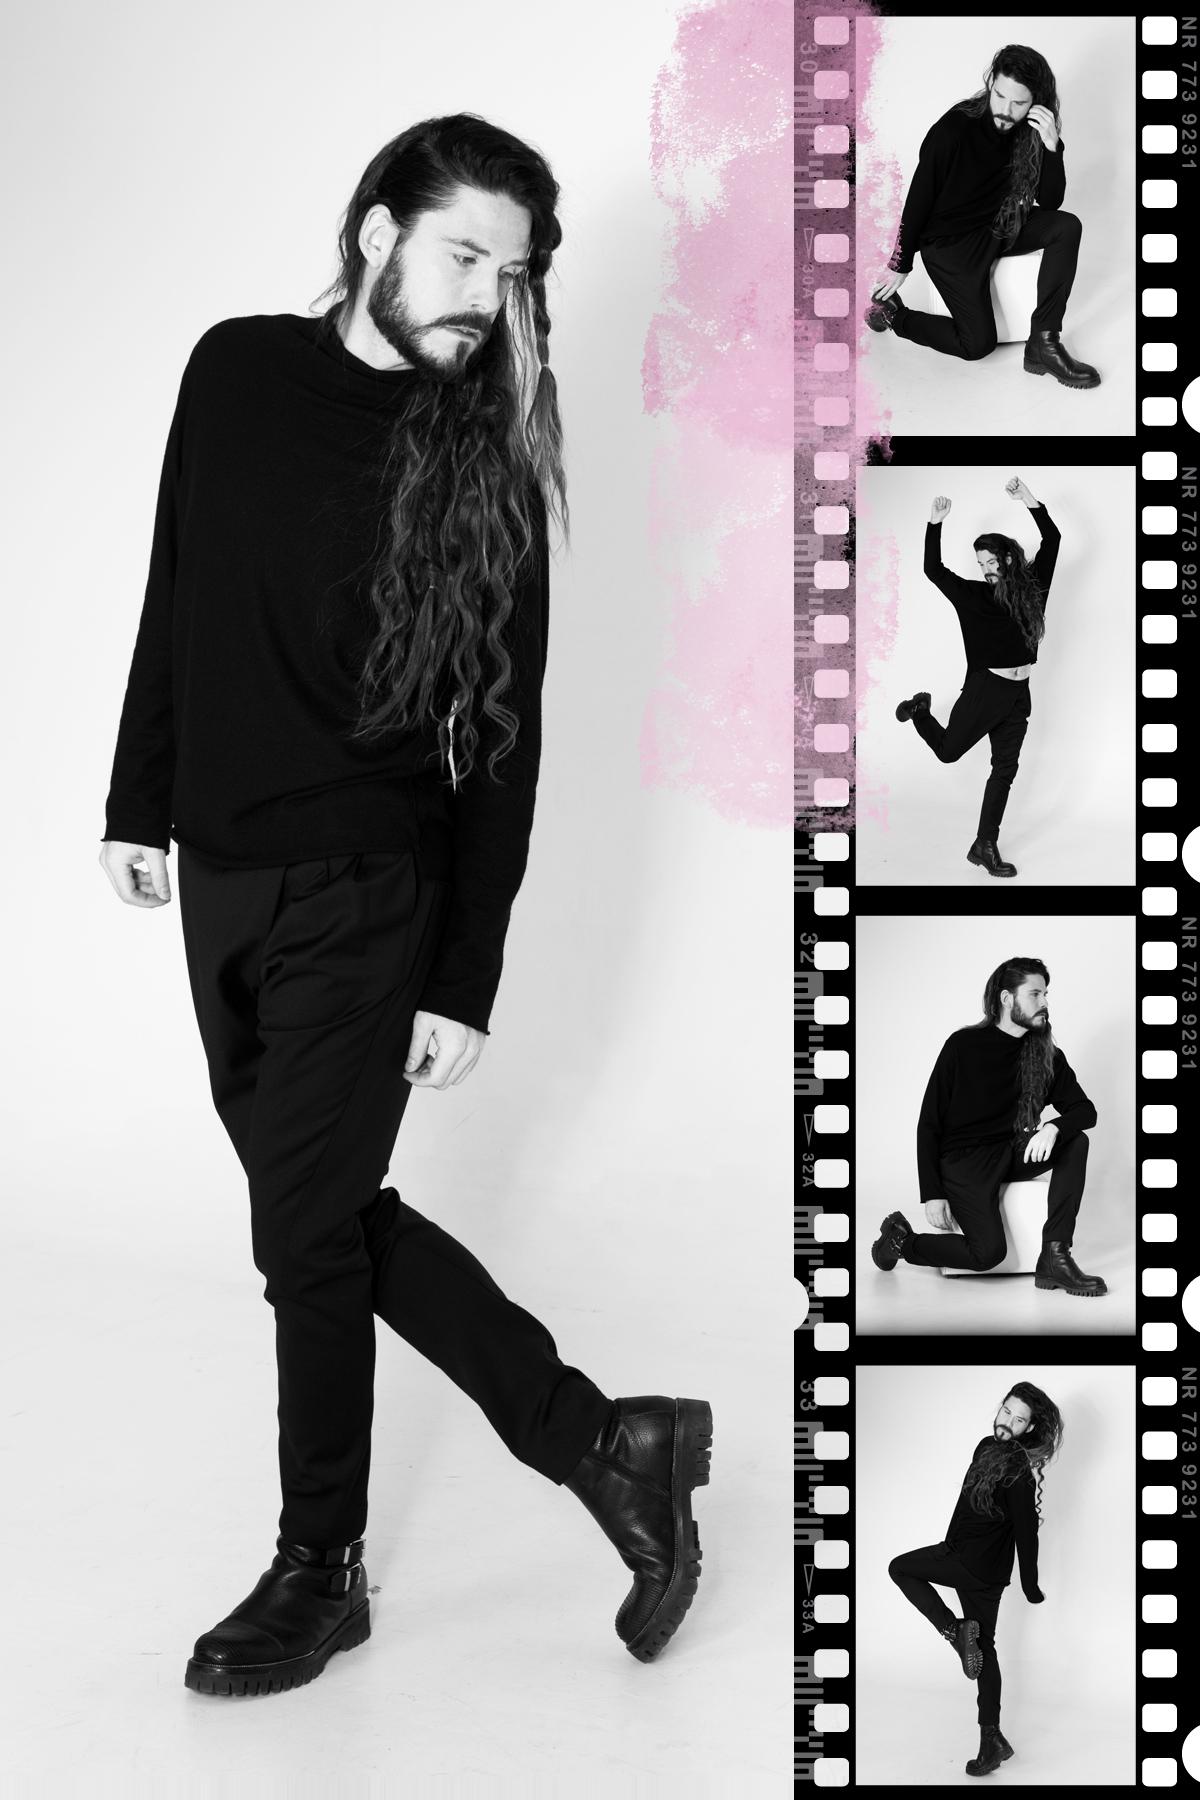 Editorial-Aleks-Kurkowski-Malefashion-Designer-Mode-High-Fashion-Avantgarde-Menswear-05